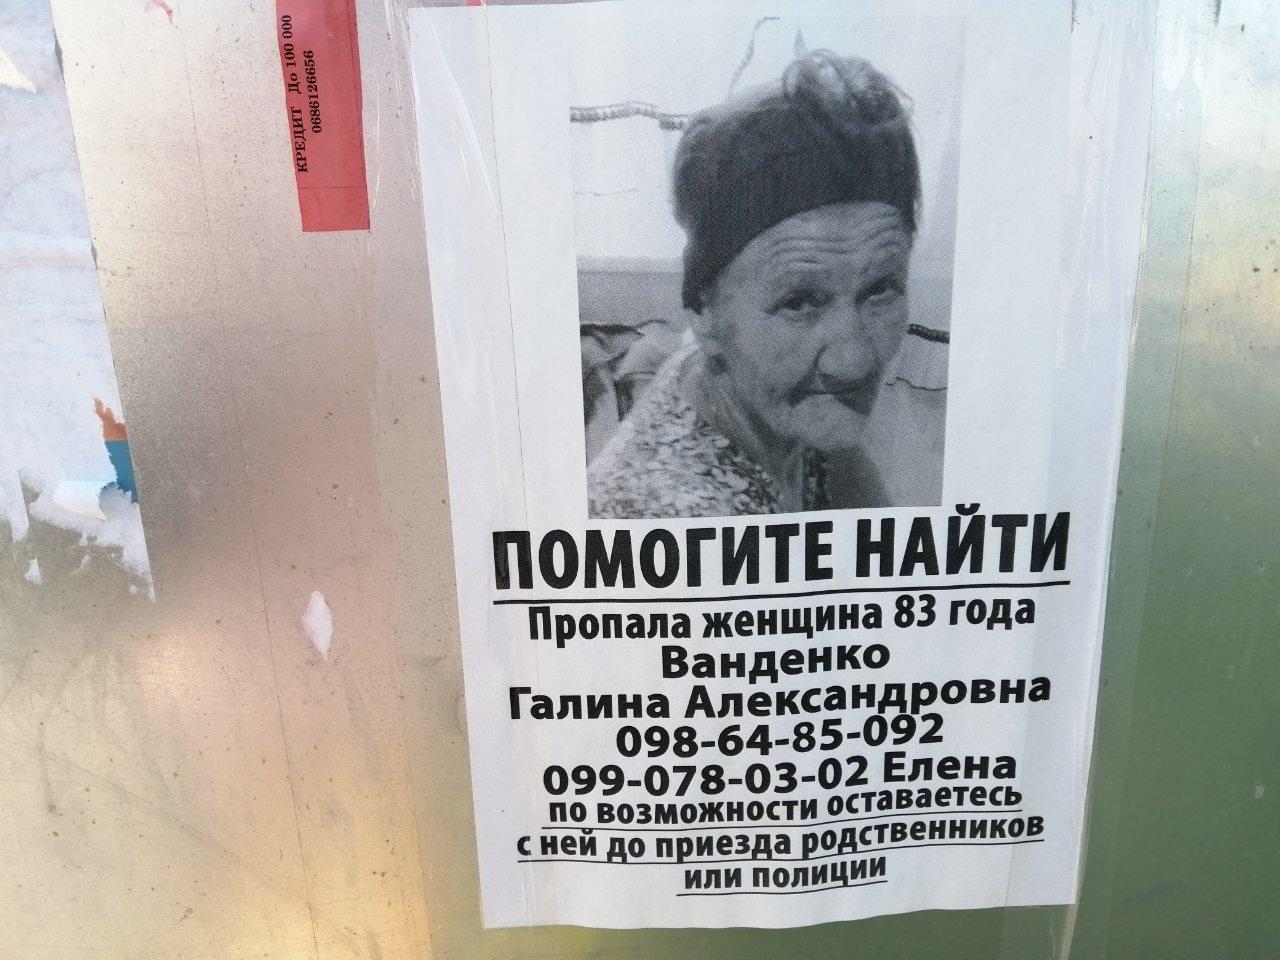 В Мелитополе две недели ищут пропавшую пенсионерку , фото-1